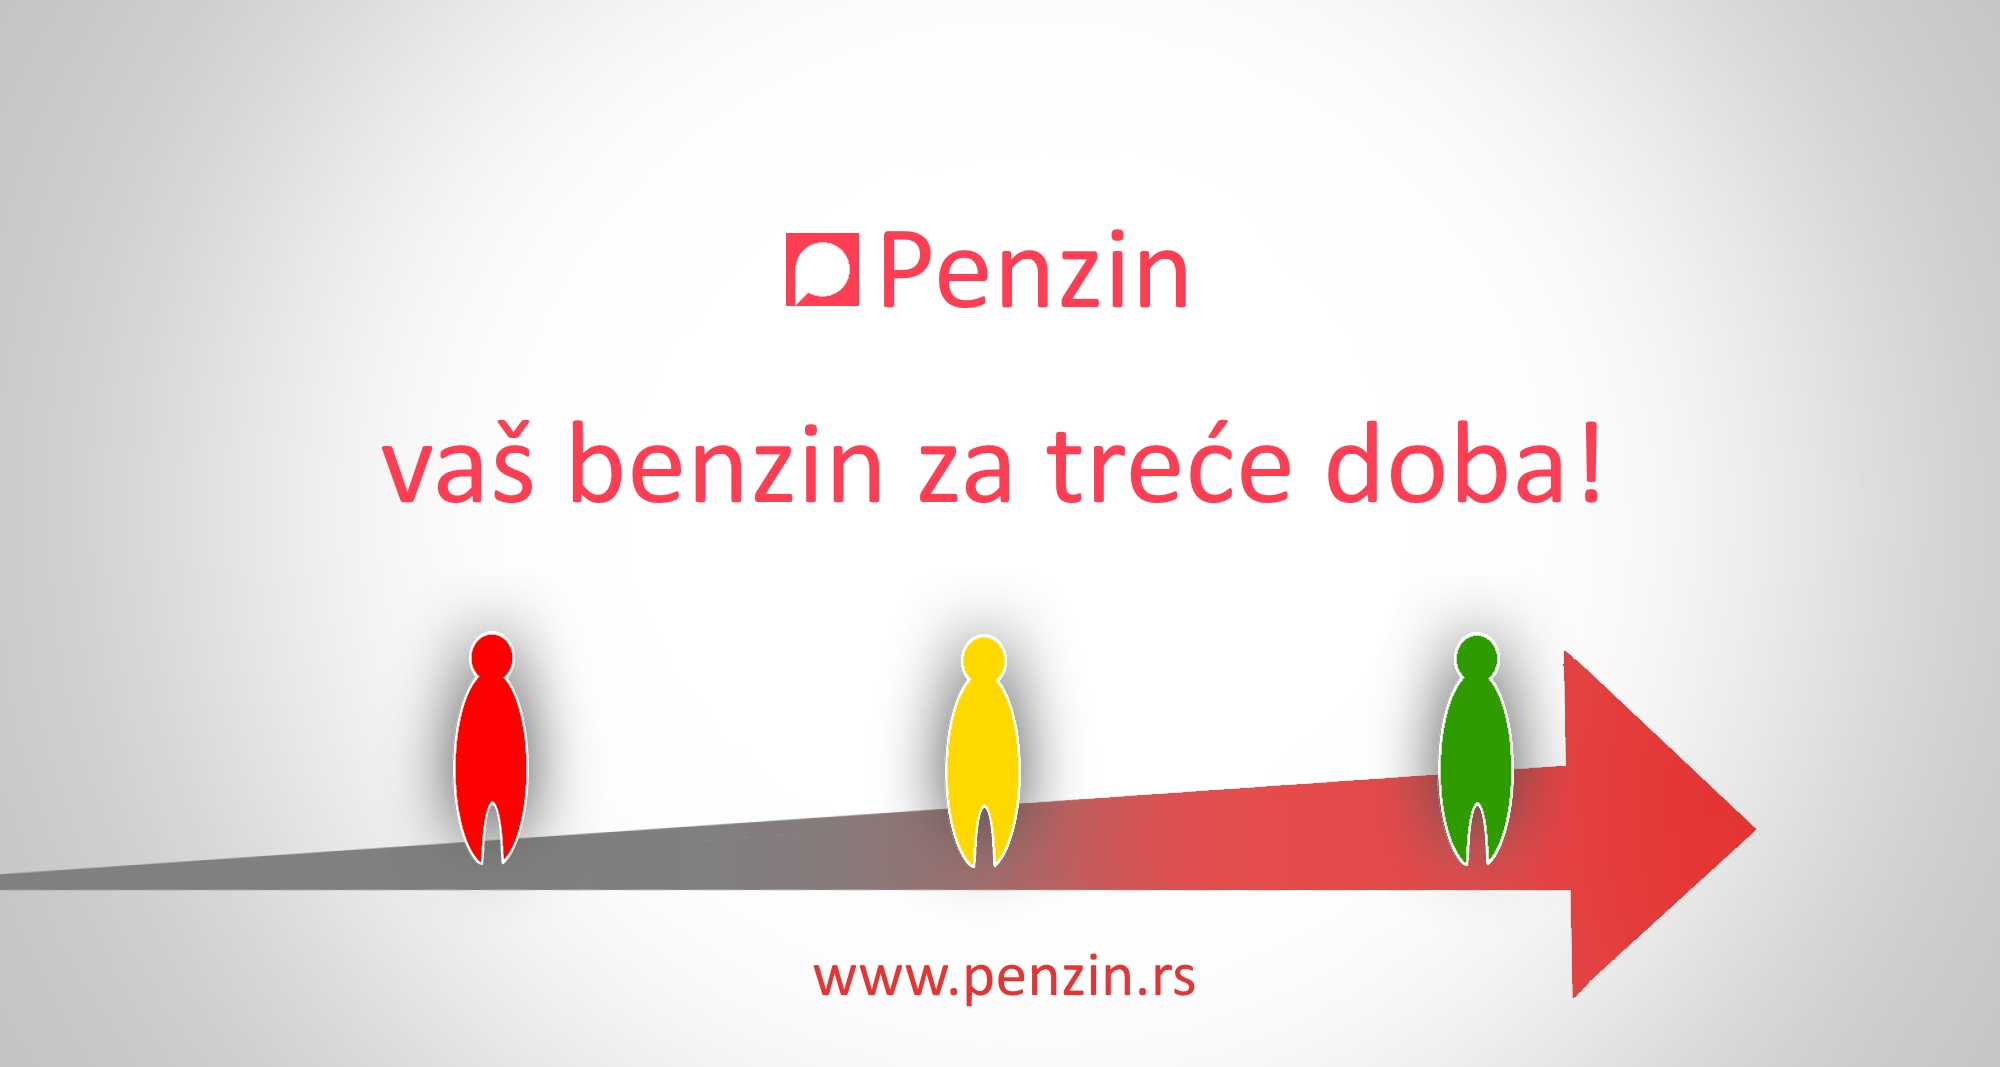 penzin-trece-doba-penzije-prevremene-starosne-invalidske-porodicne